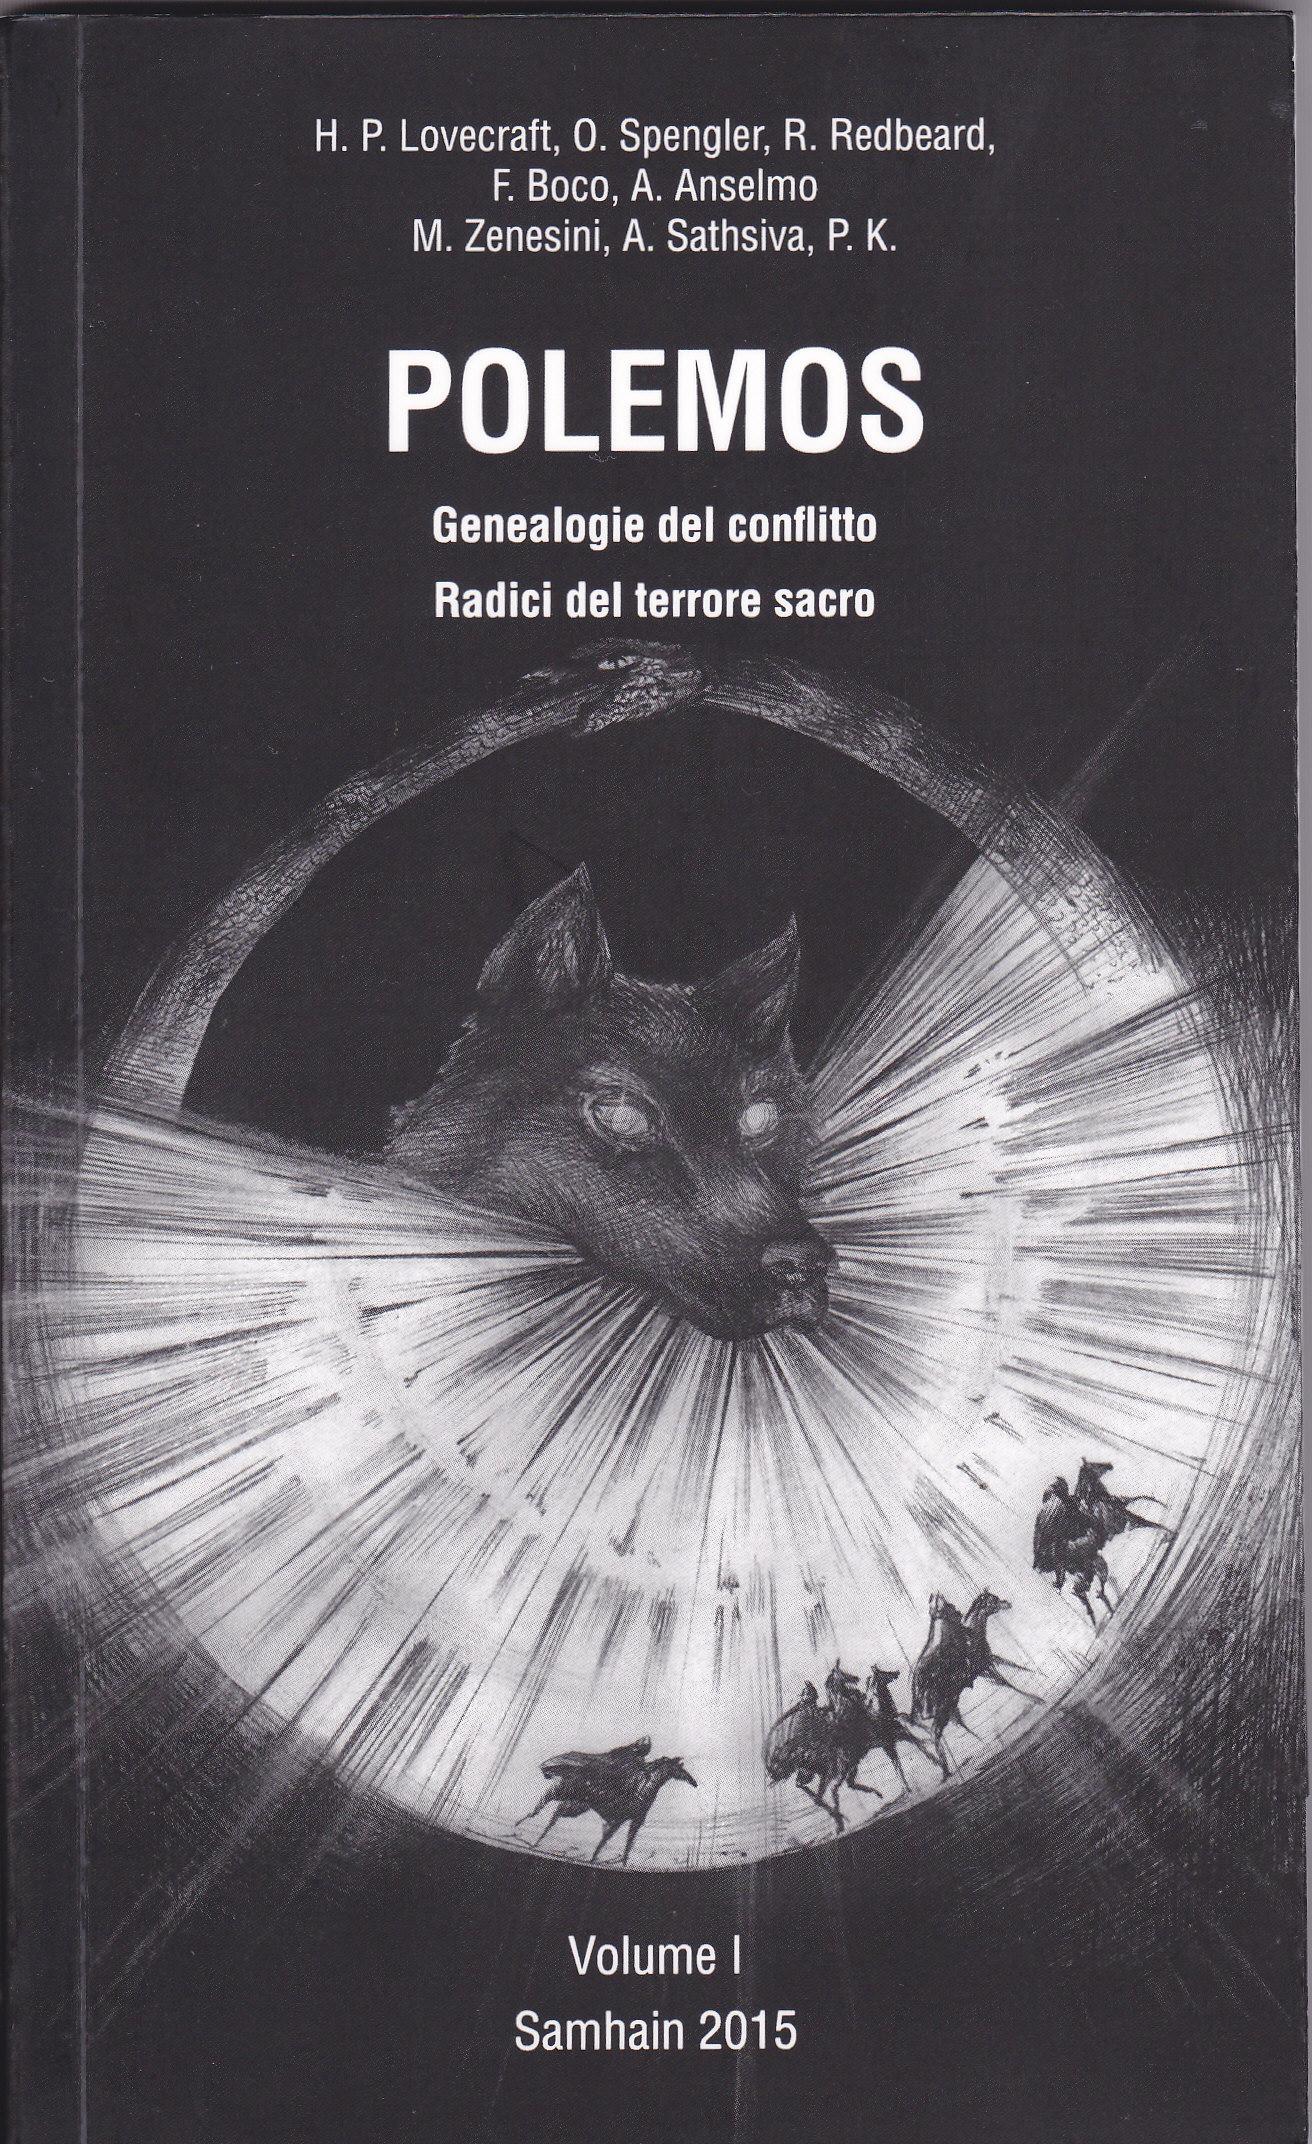 Polemos, Genealogie del conflitto. Radici del terrore sacro – Volume I Samhain 2015